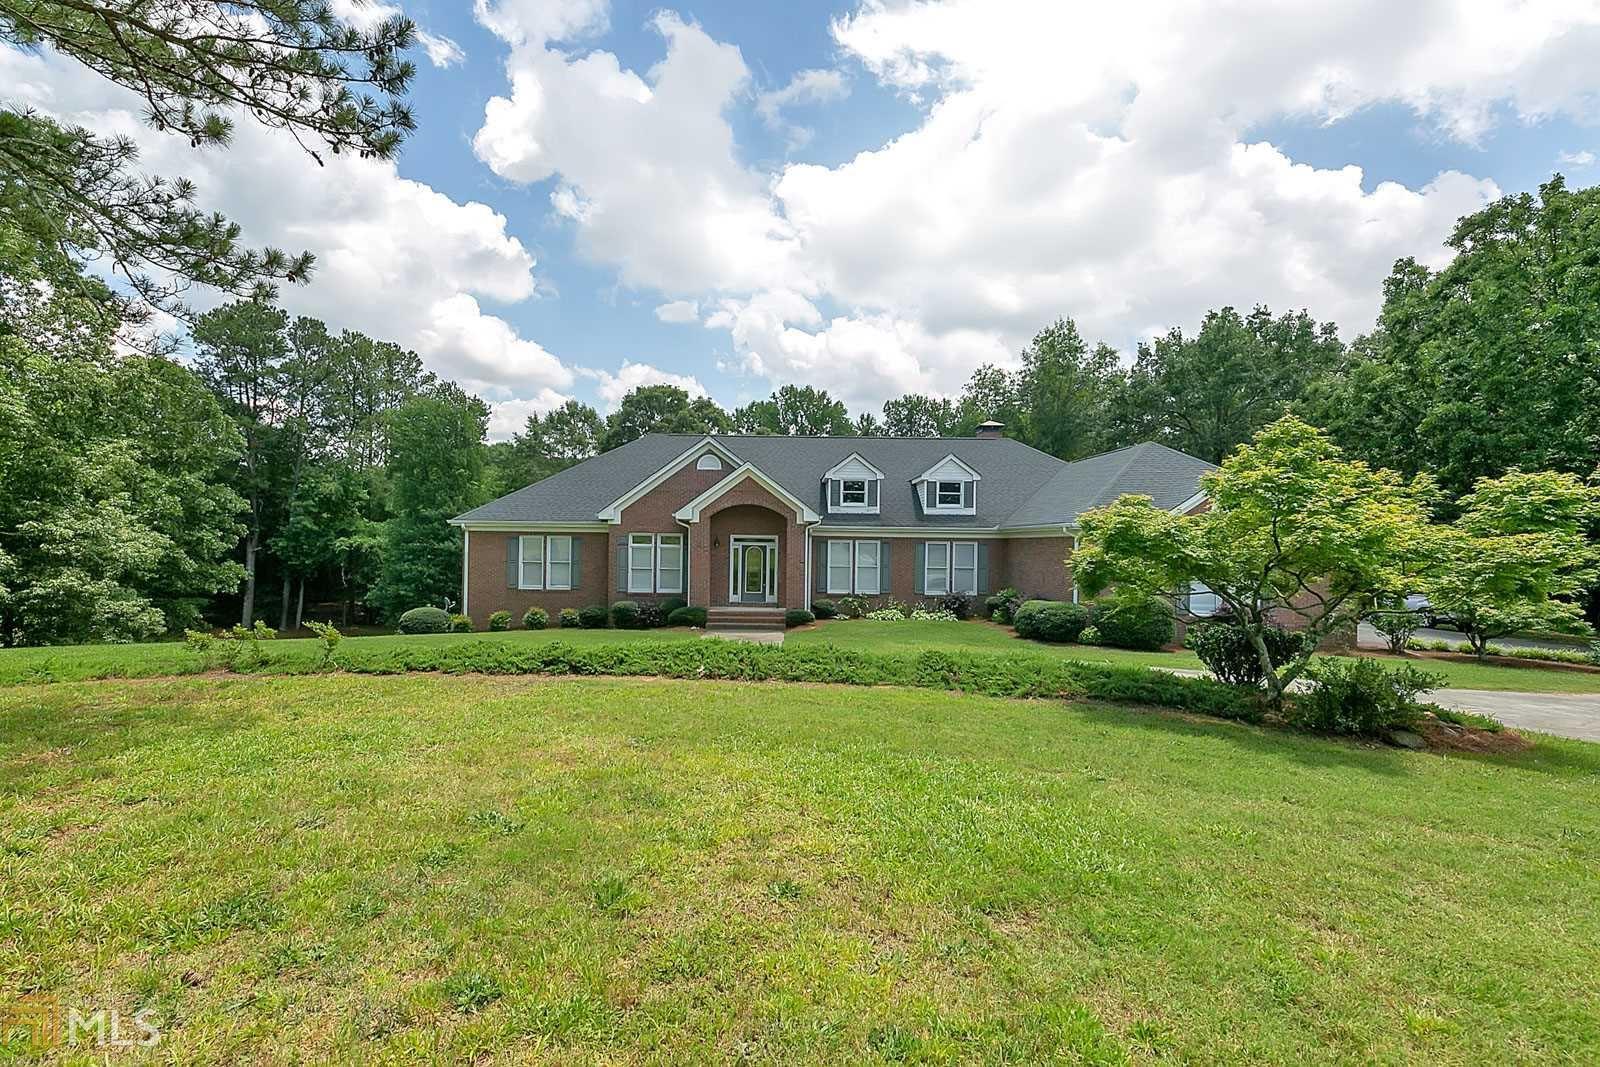 1595 New Hope Rd, Lawrenceville, GA 30045 - #: 8805534